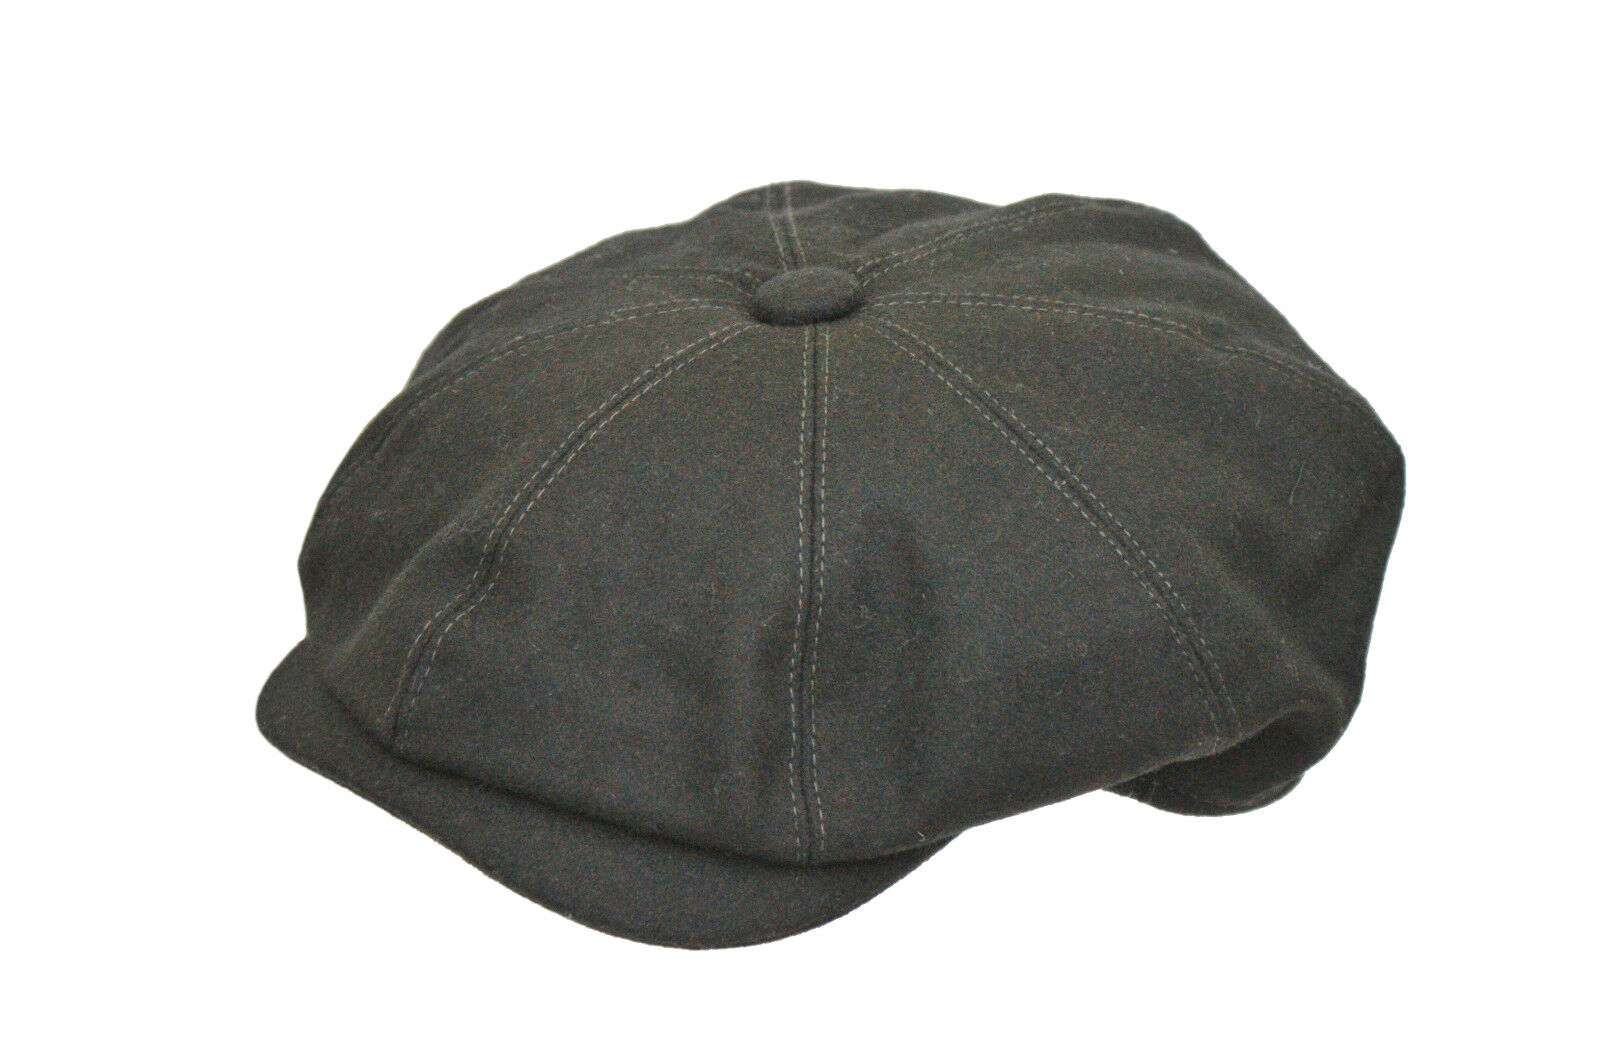 New Men/'s Wool Chunky Black 8 Panel Herringbone Peaky Baker Boy Gatsby Cap CH4